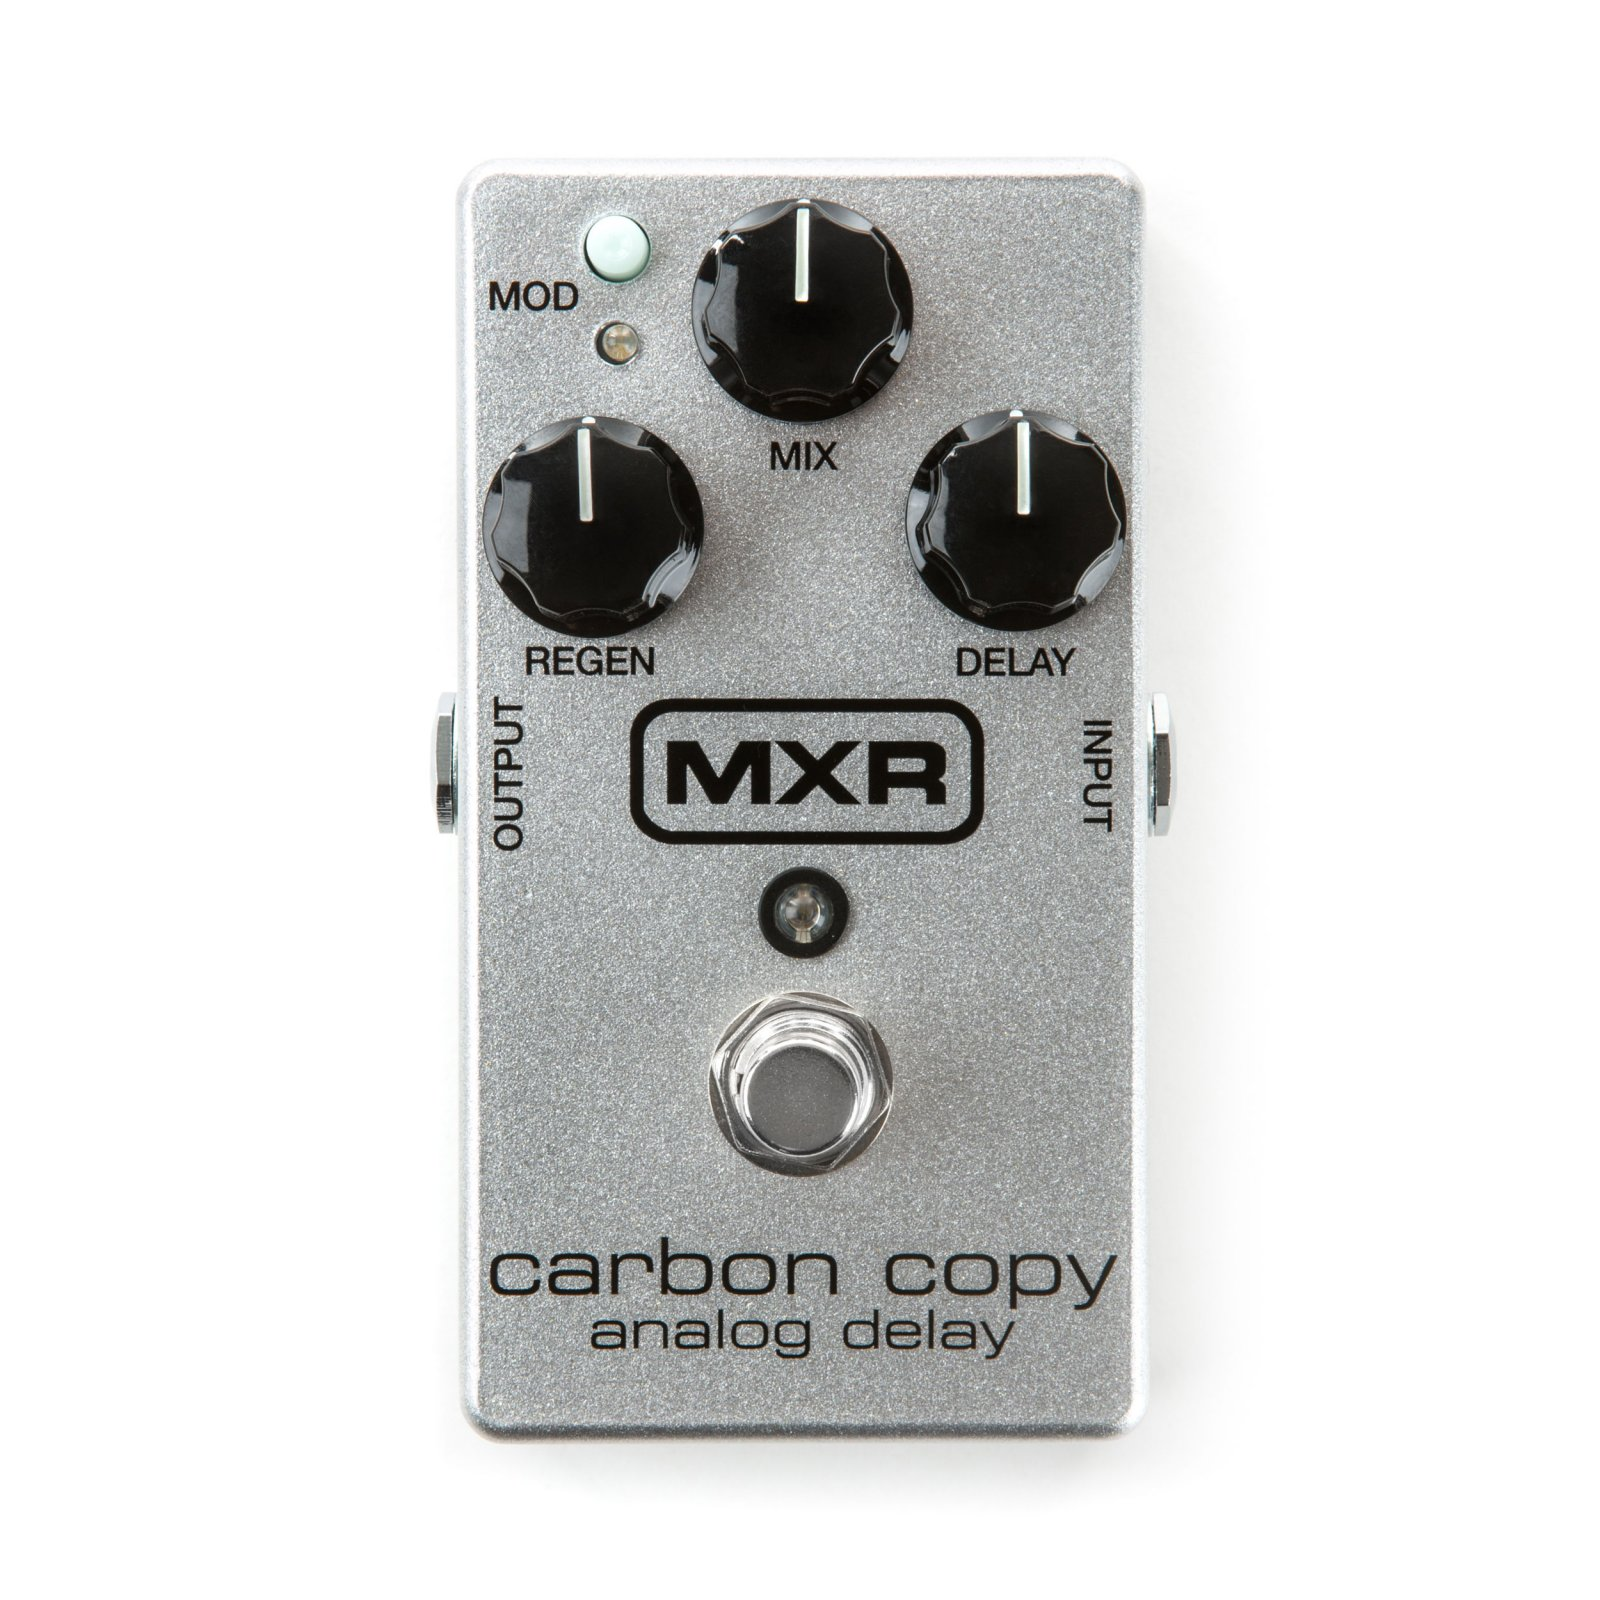 MXR Carbon Copy 10th Anniversary